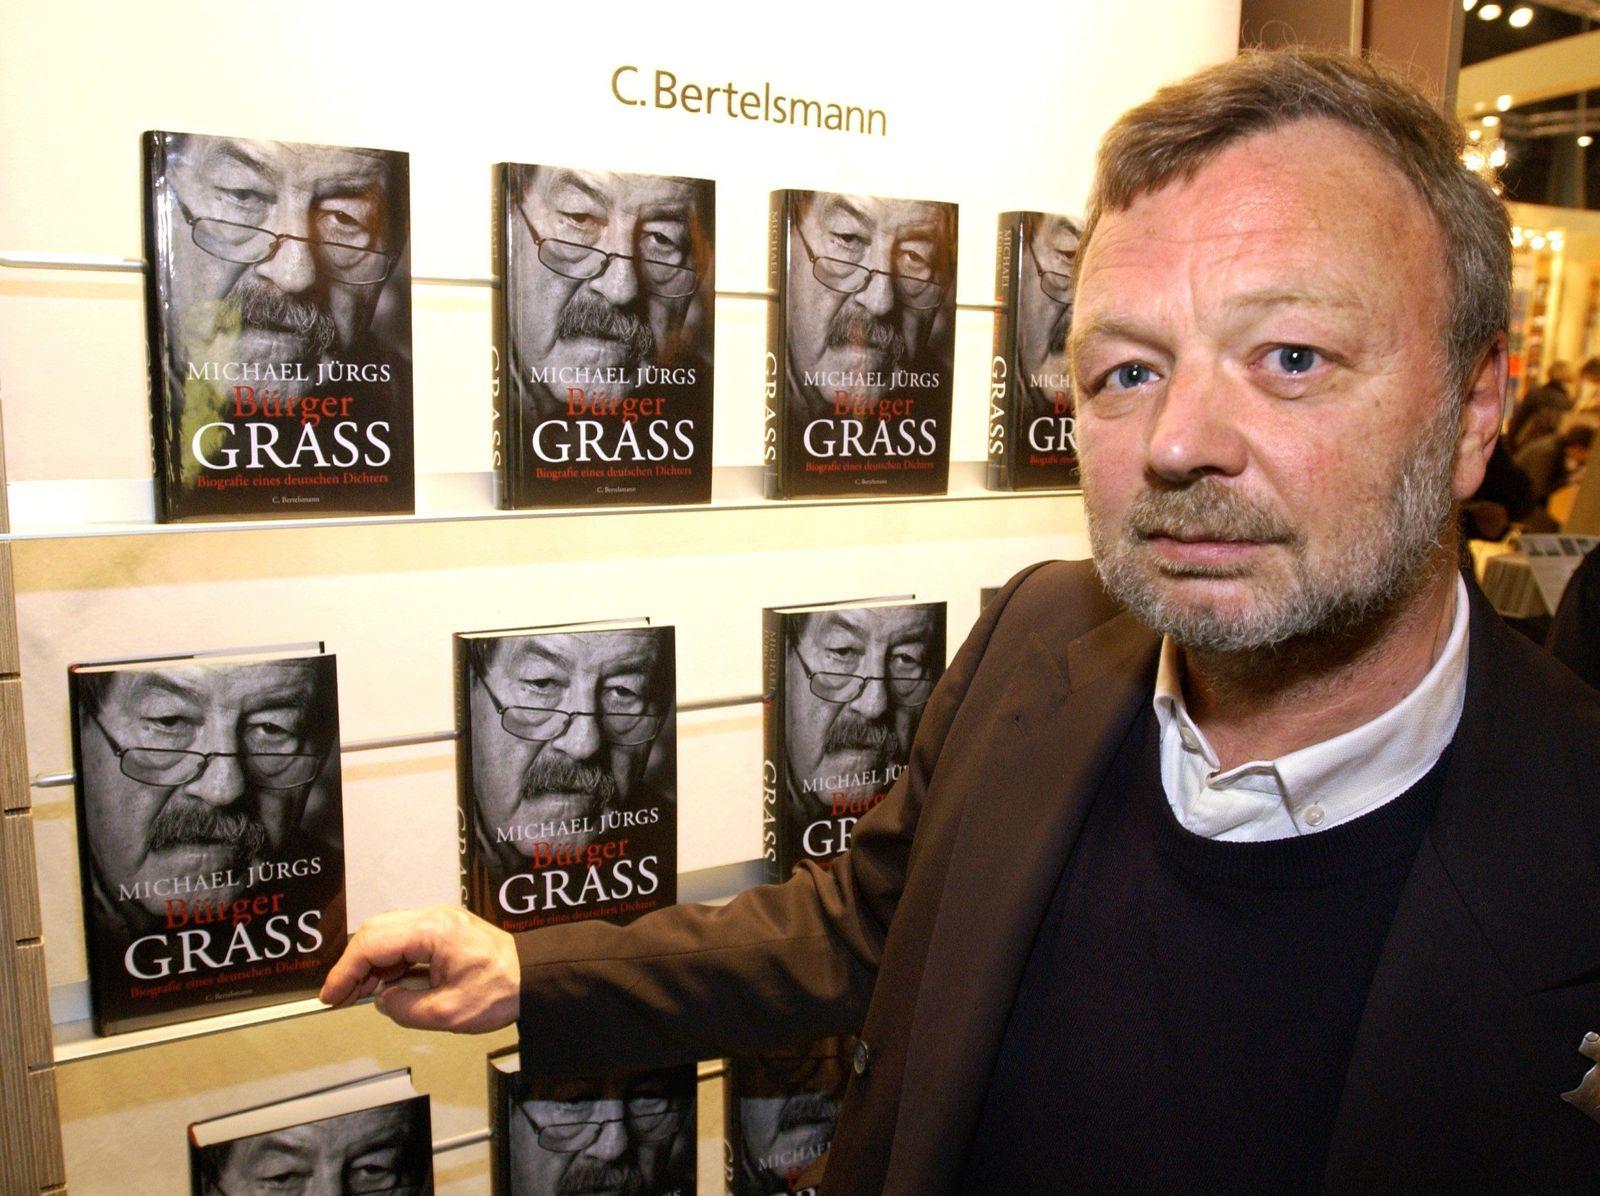 Michael Jürgs / 2002 /Frankfurter Buchmesse